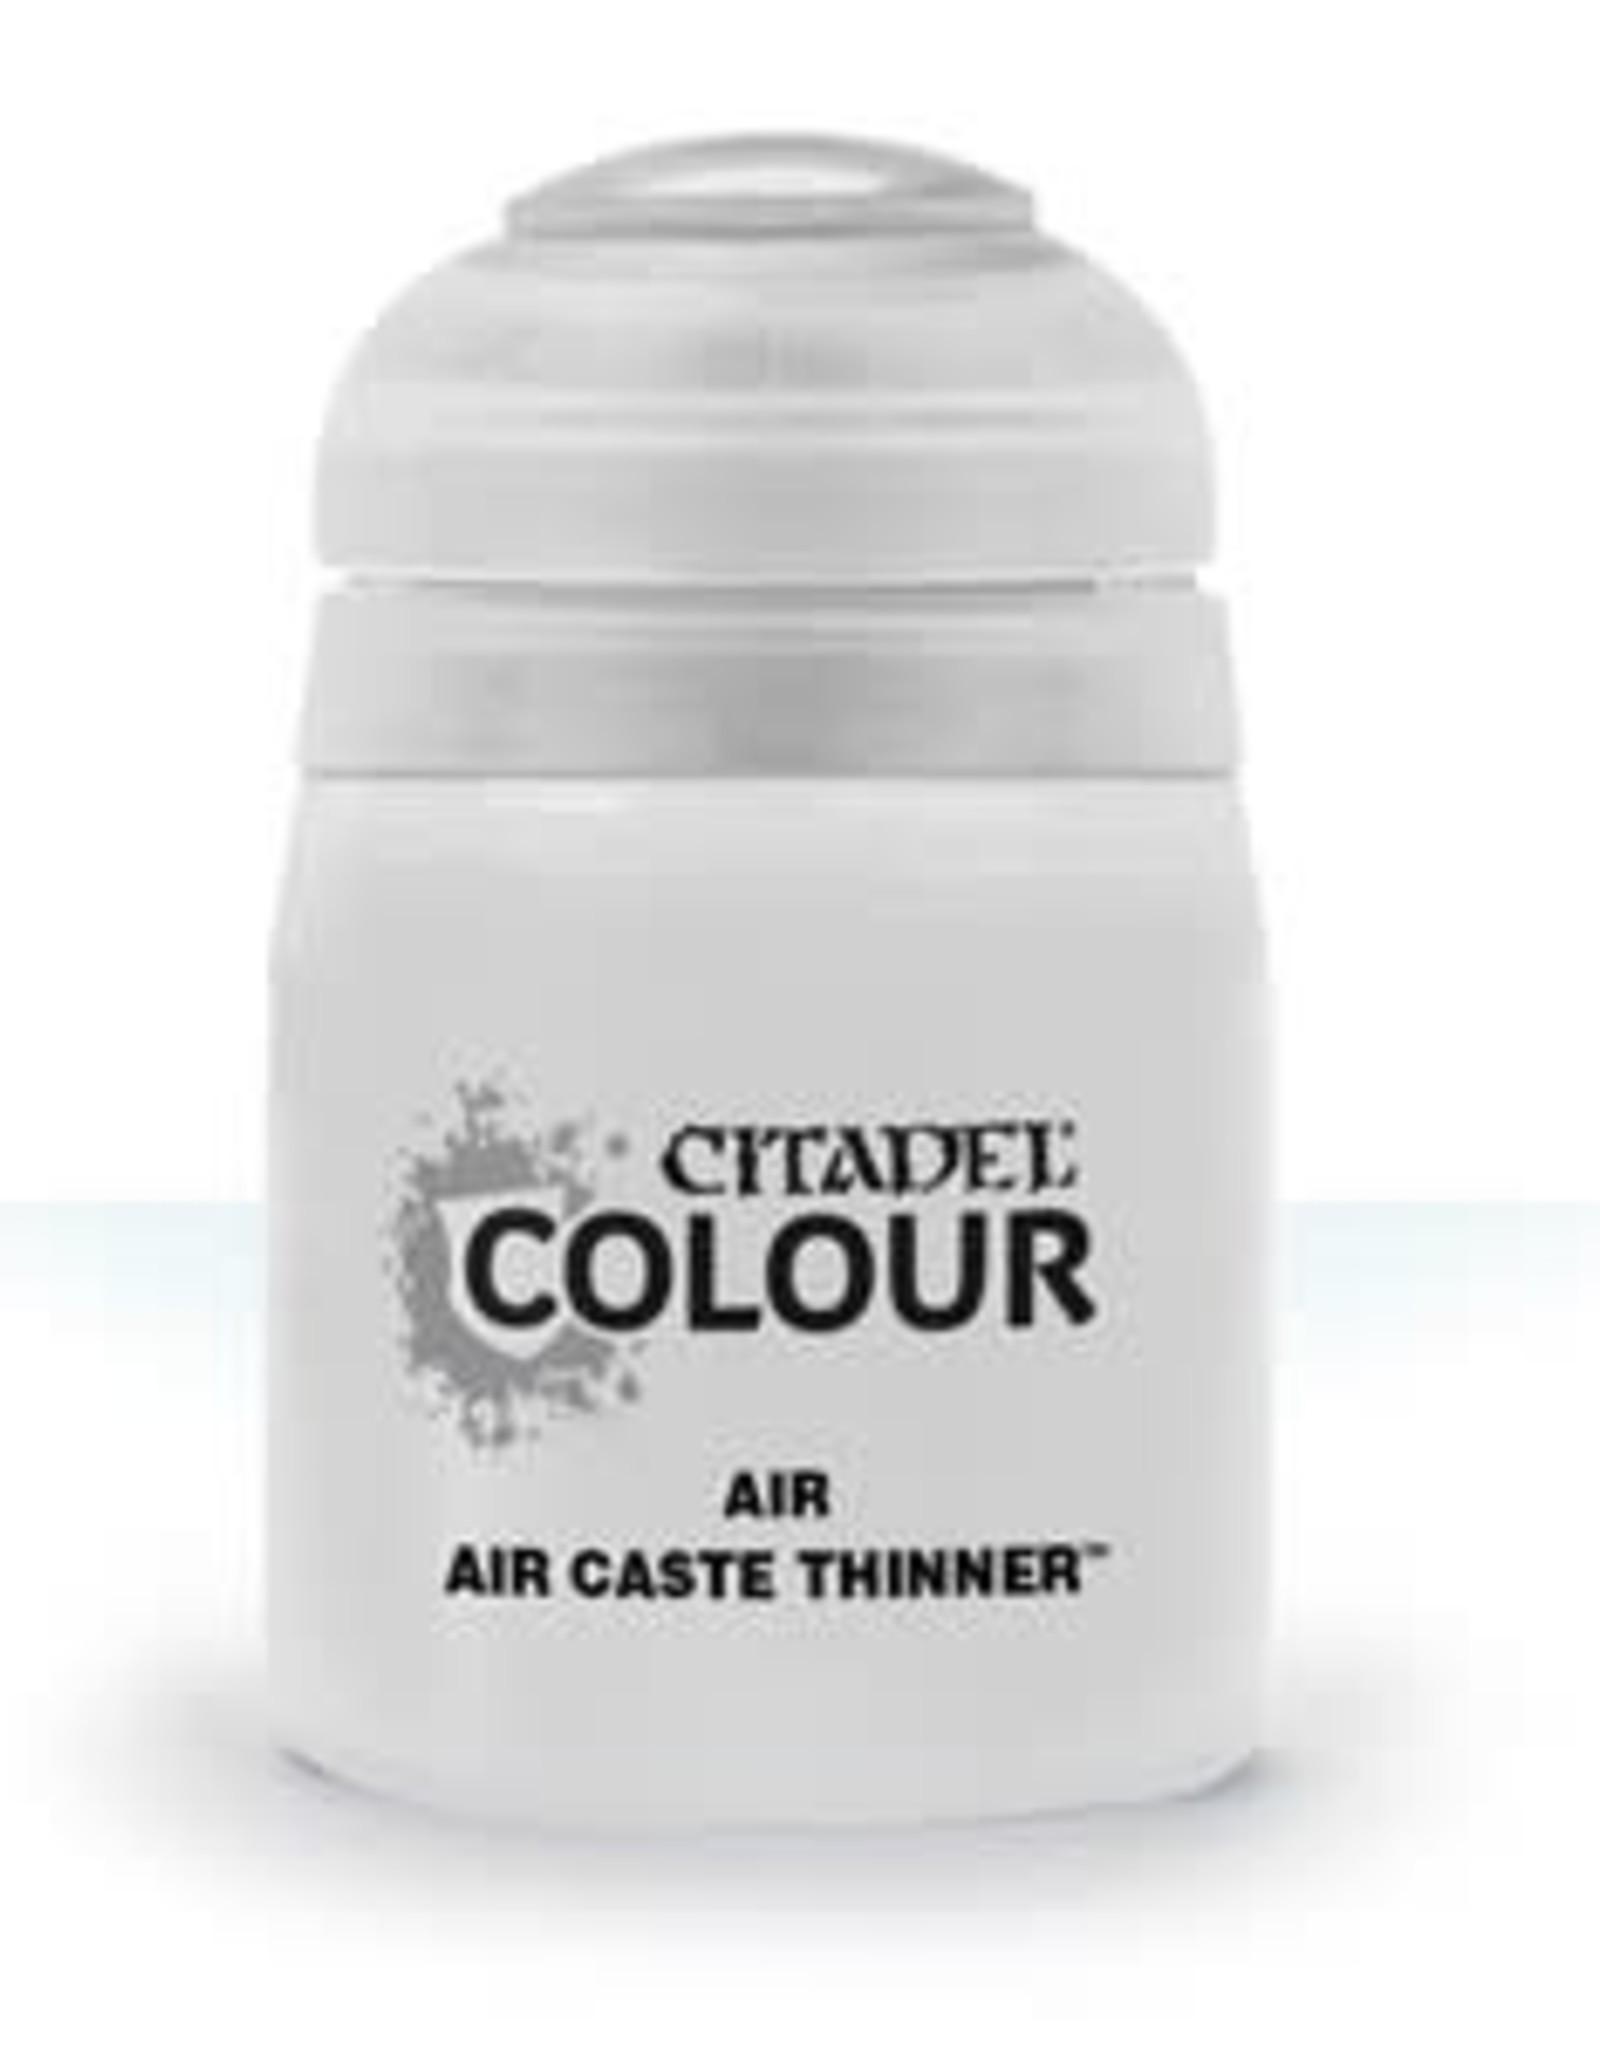 Citadel Paint Air: Caste Thinner